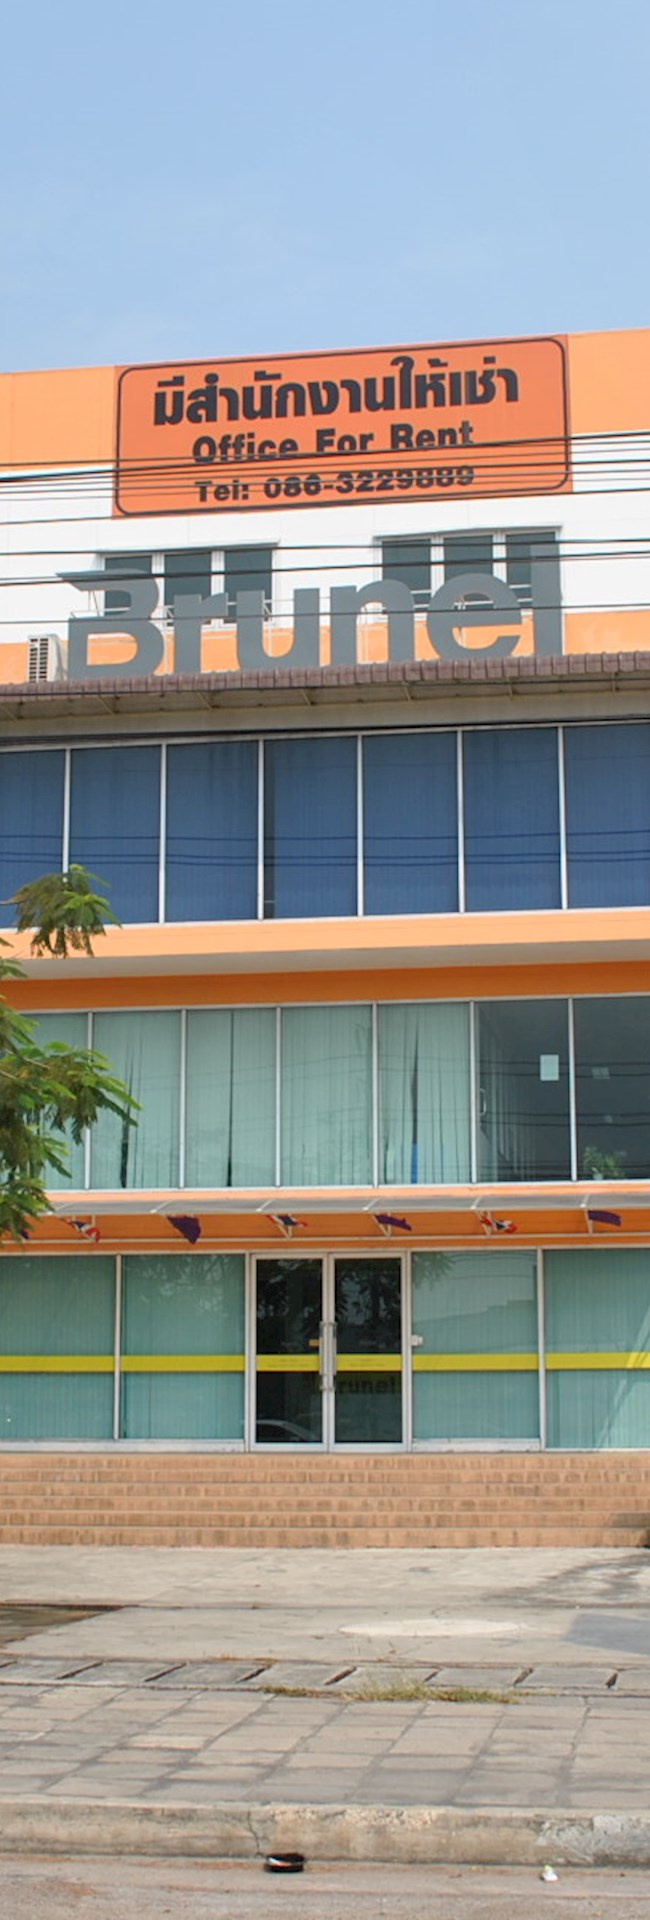 Office picture Chonburi Building 2